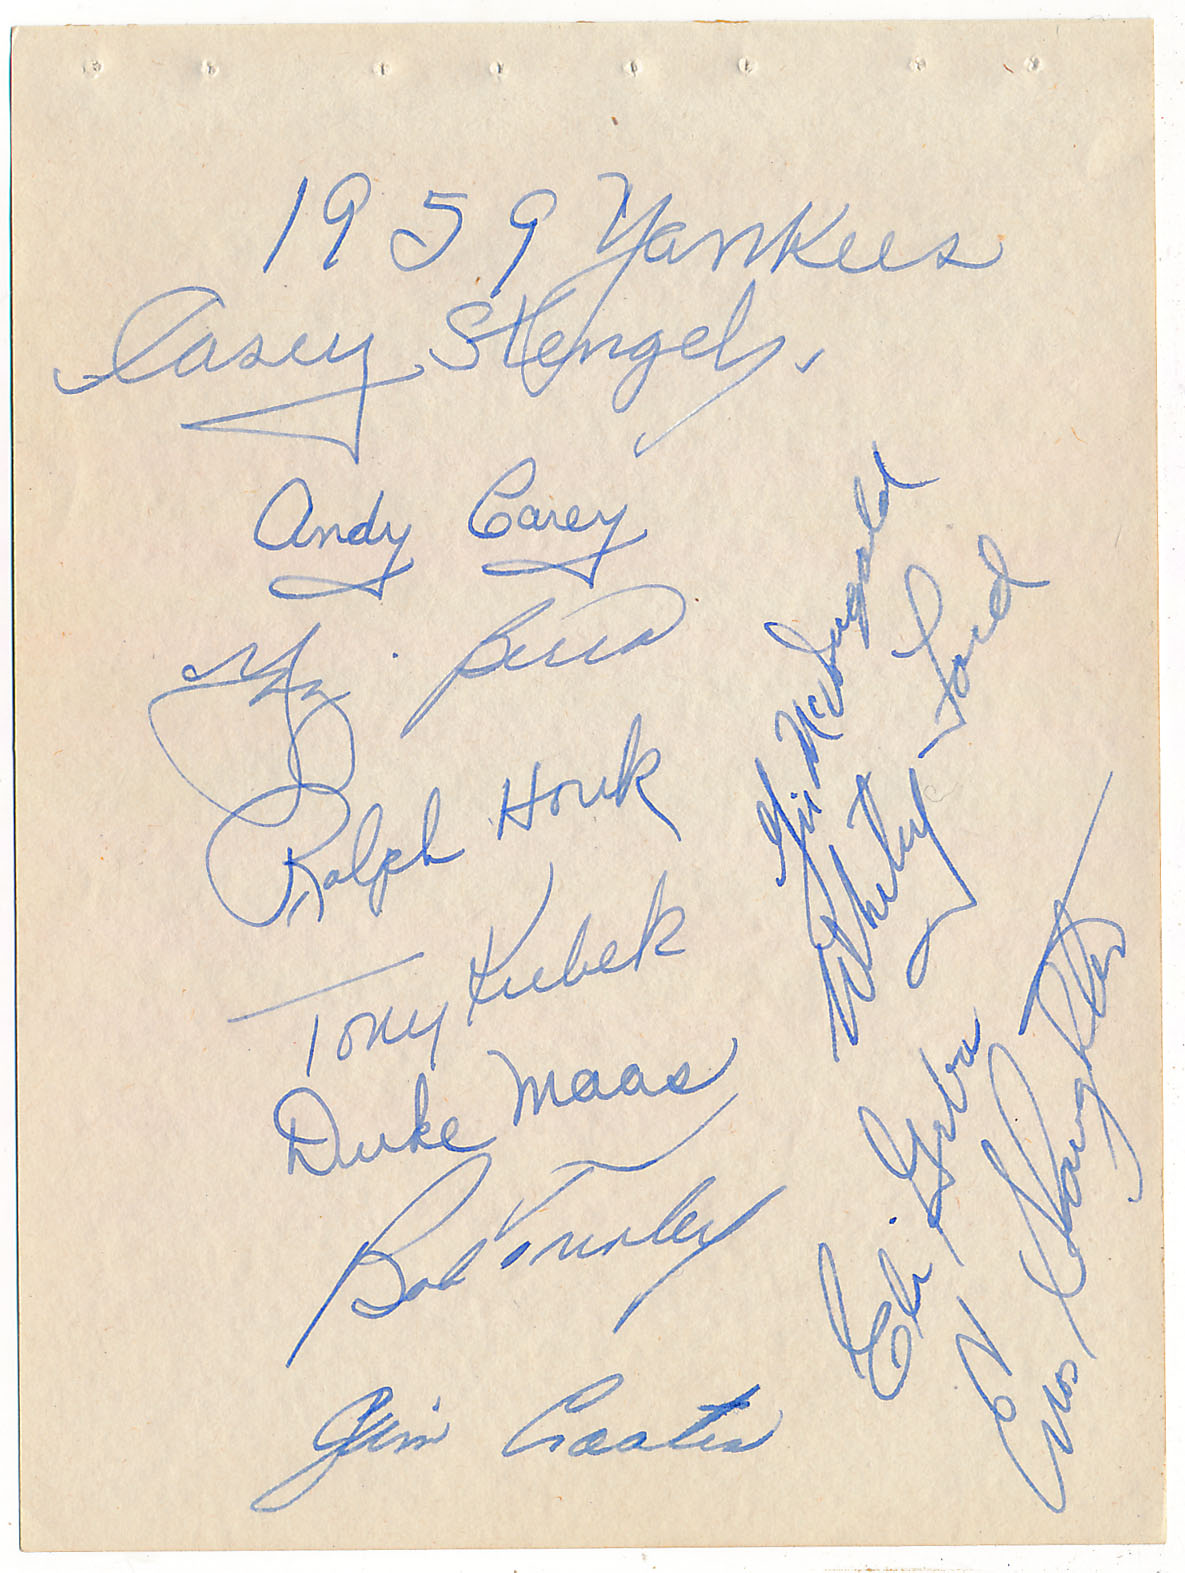 Lot #398  Team Sheet  1959 Yankees (12 sigs) w/Maas & Stengel Cond: 9